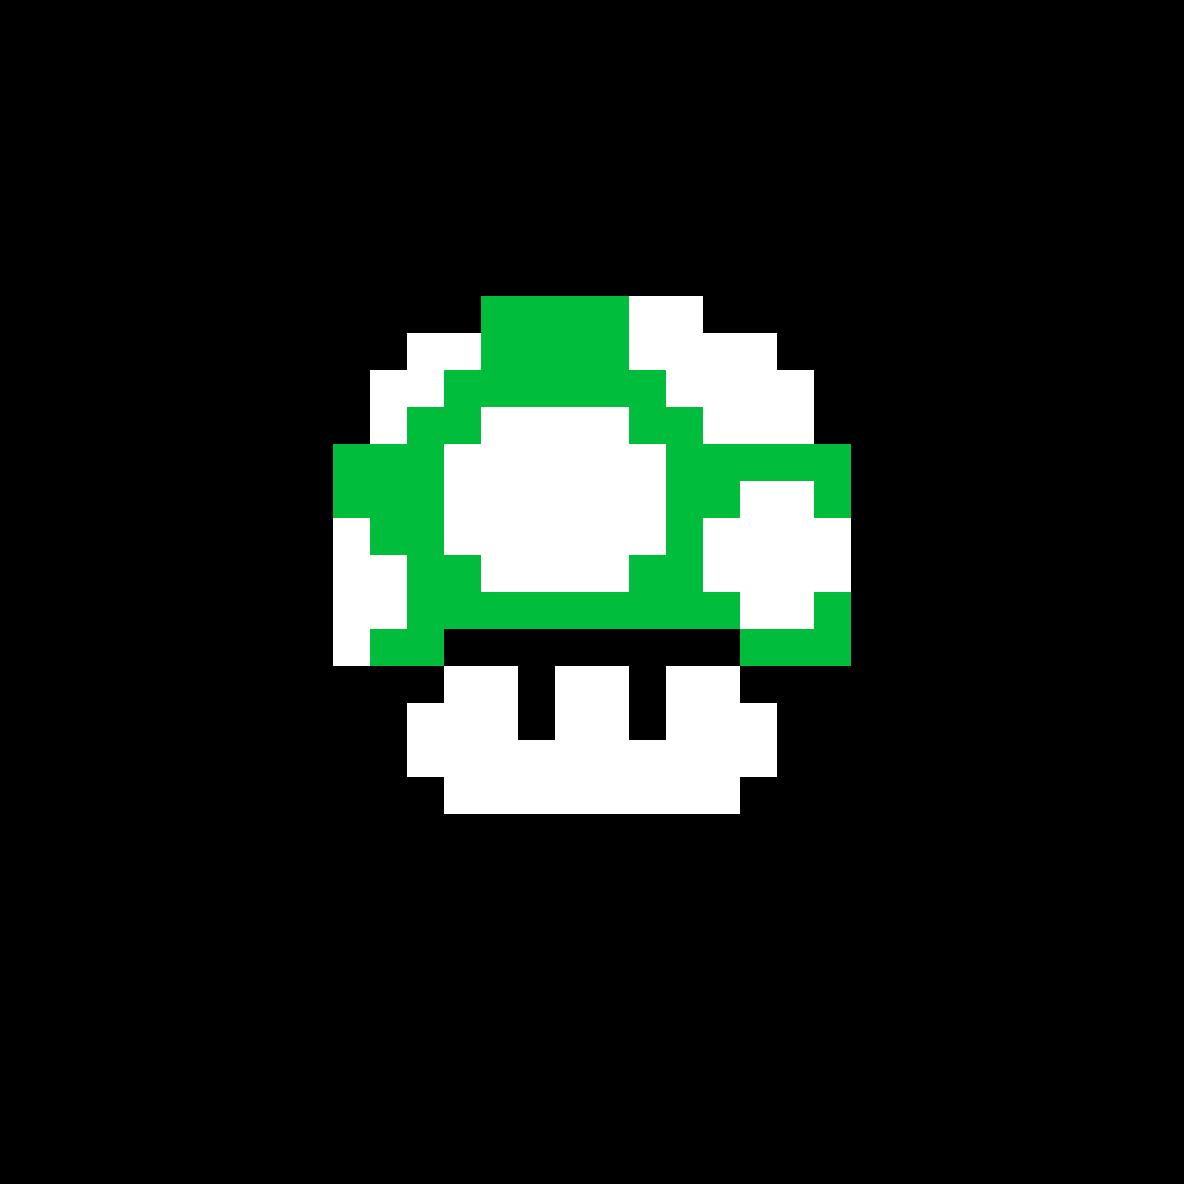 Super Mario Bros Green Mushroom by Insano